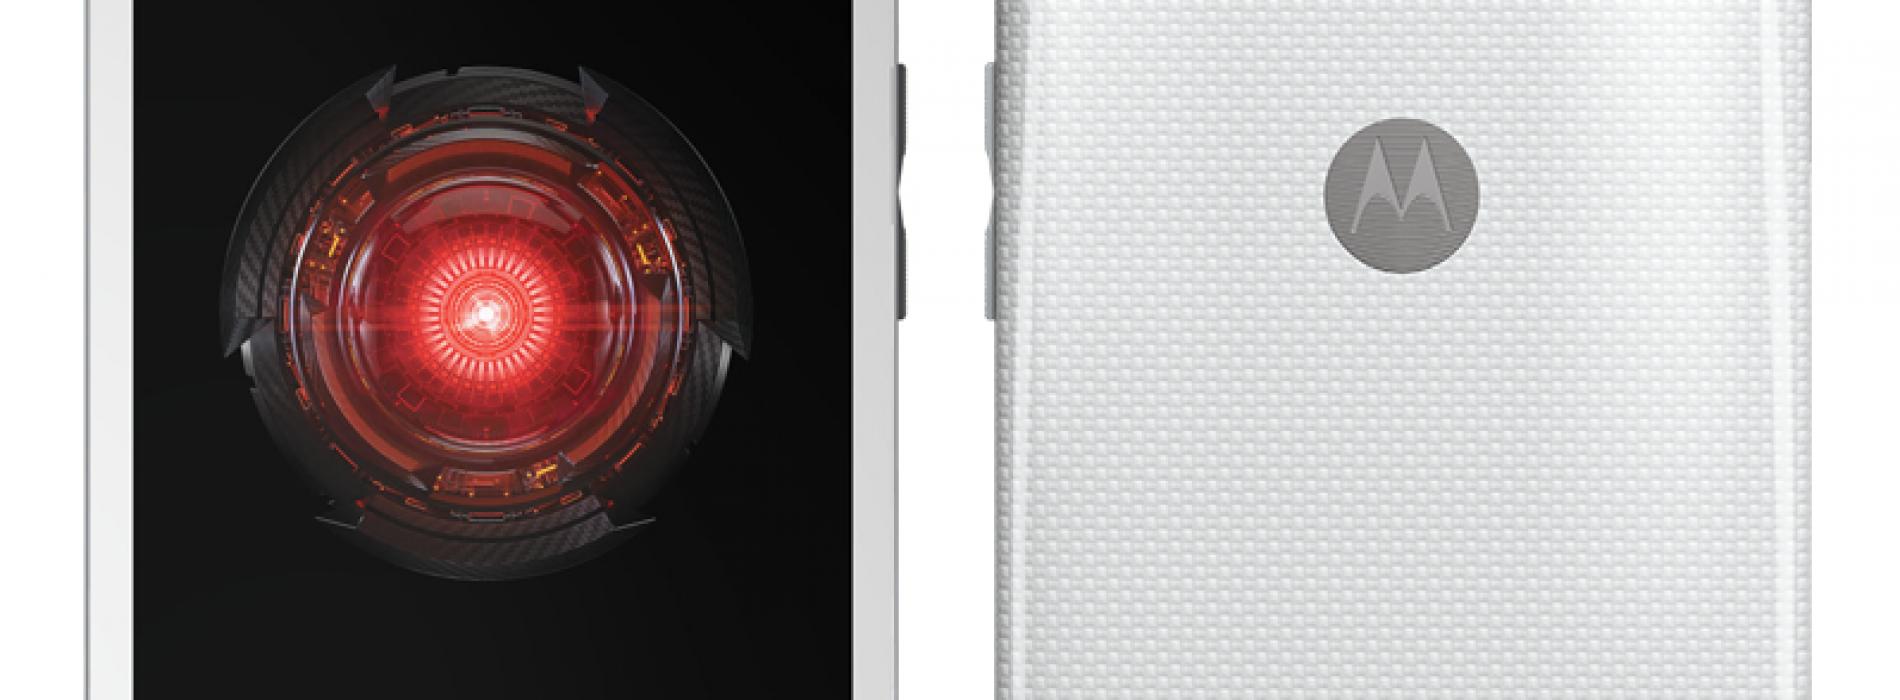 White versions of Motorola Droid Ultra, Droid Mini leaked for Verizon